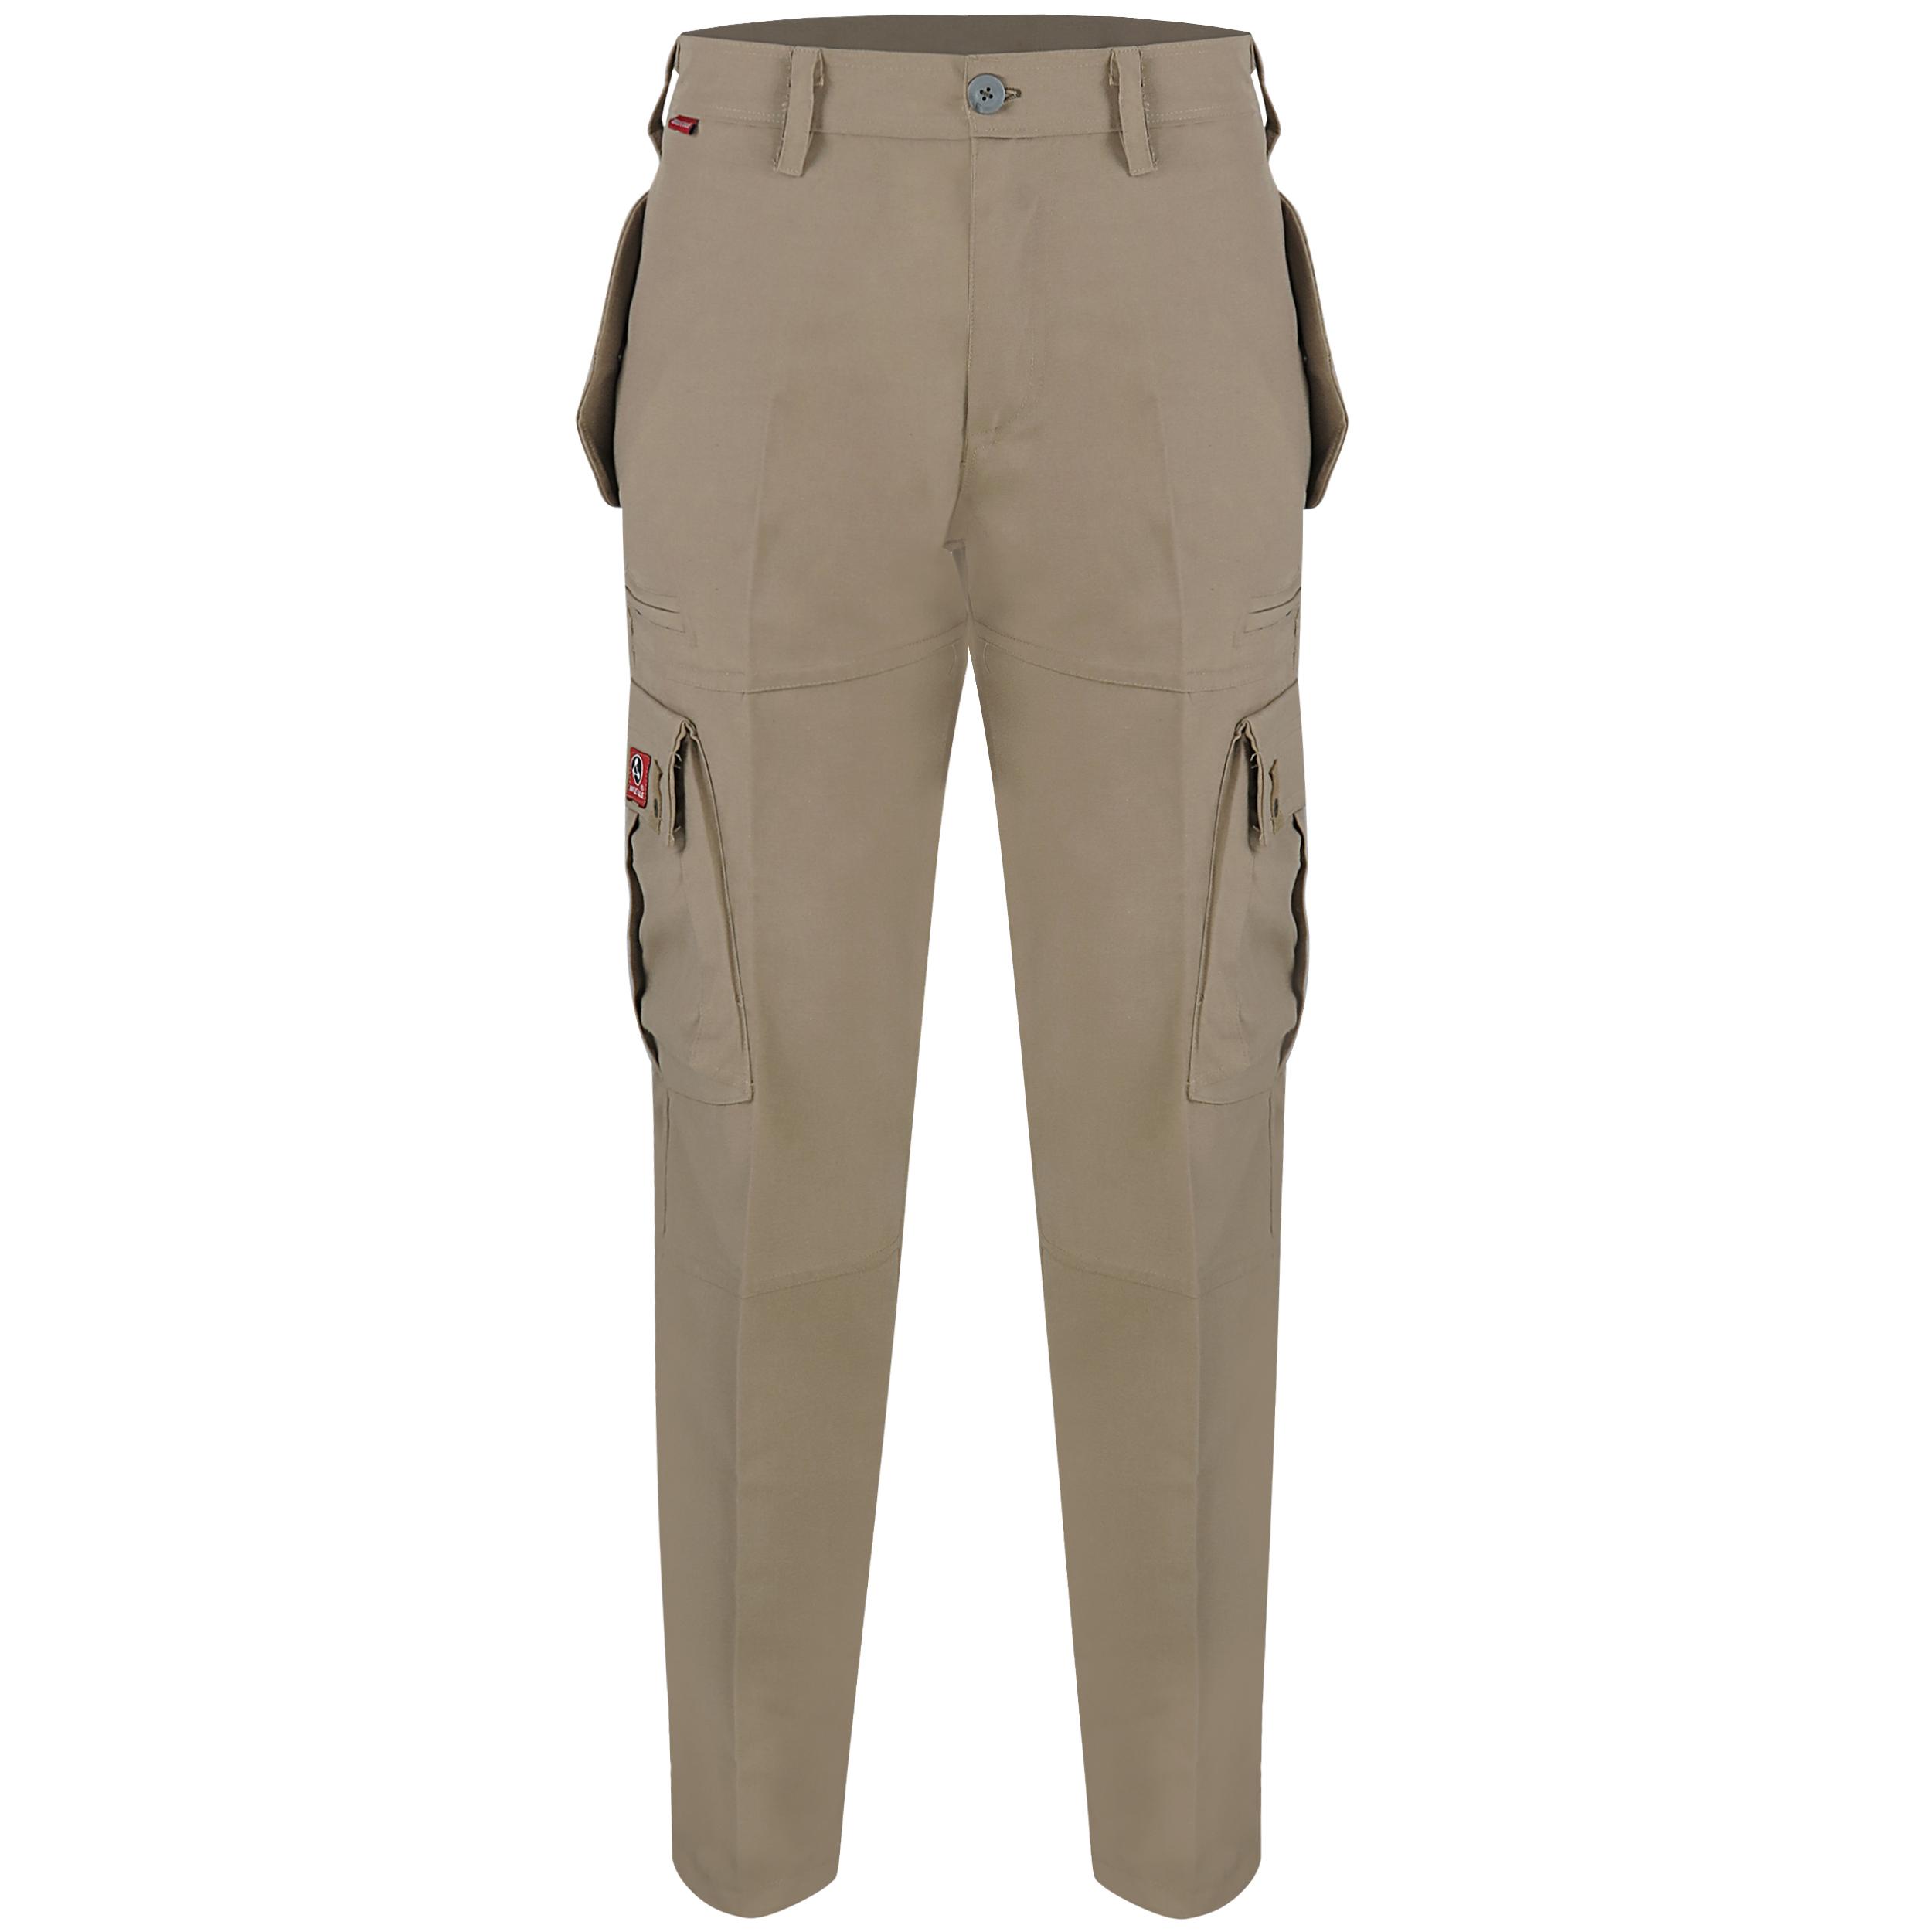 شلوار مردانه مدل شش جیب